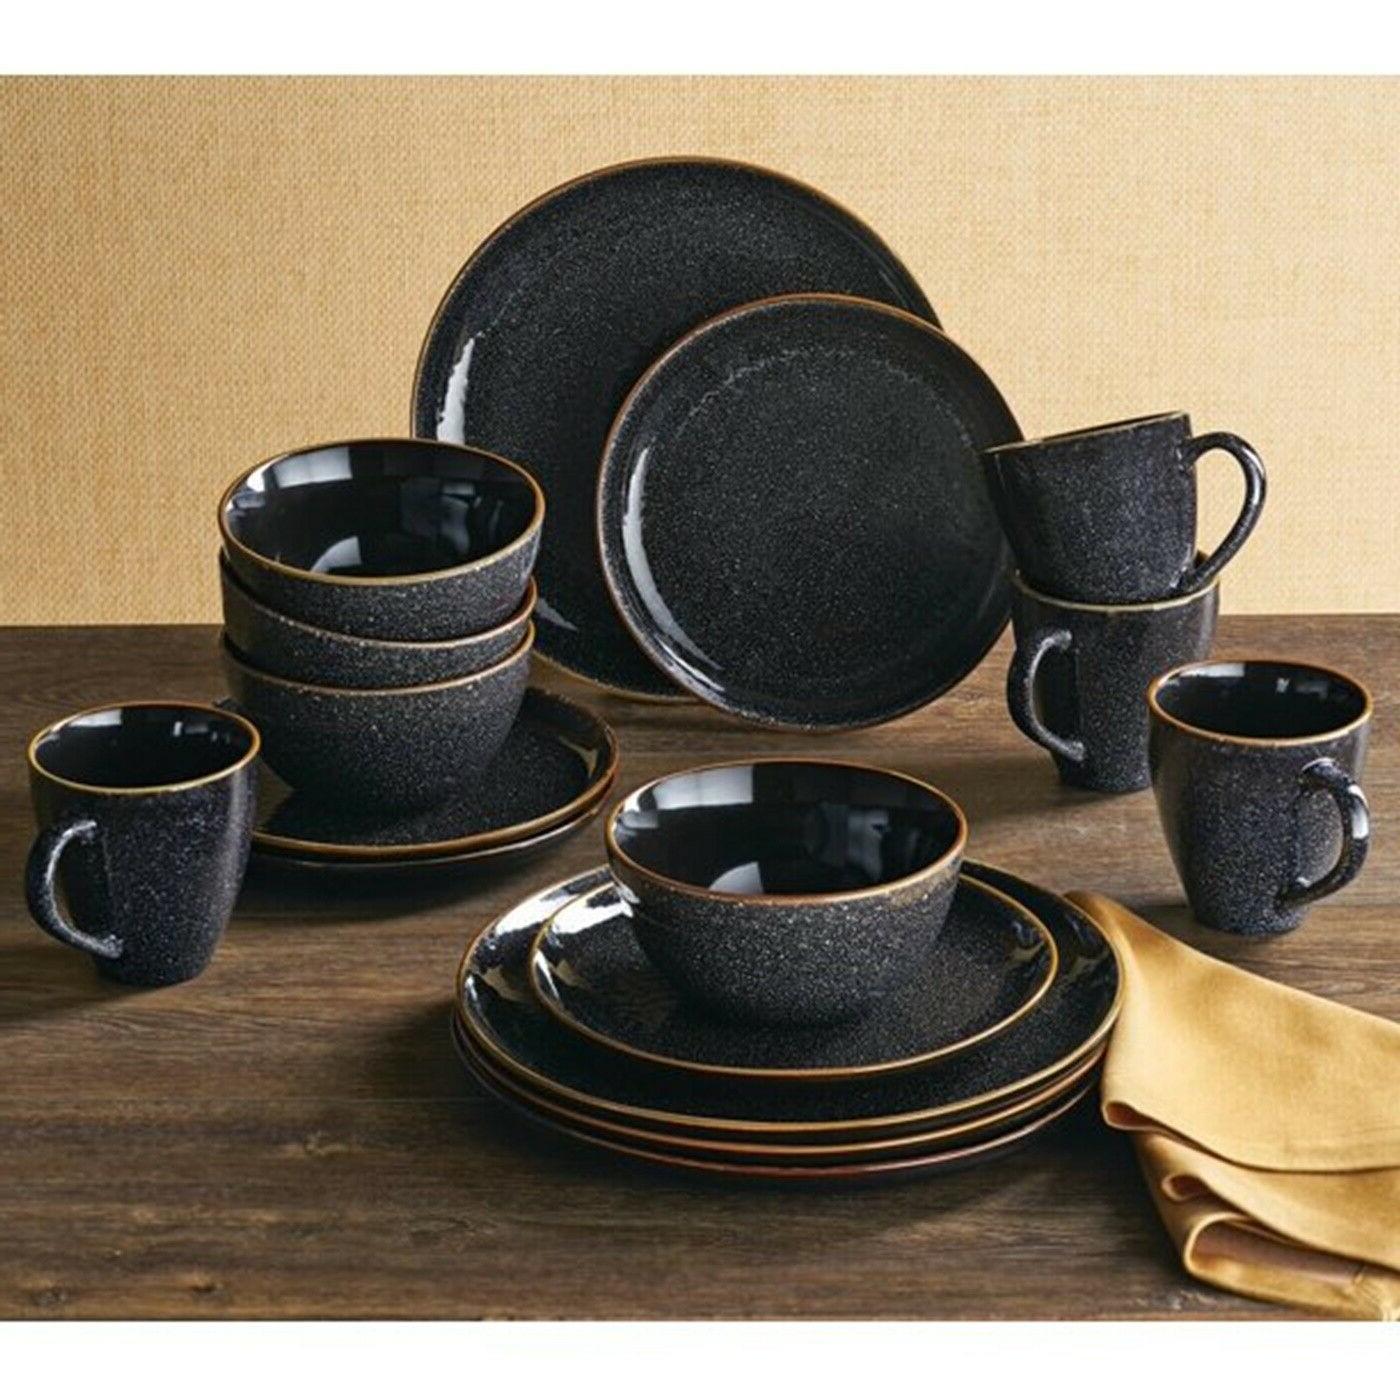 Set Dinnerware 16 Piece Dishes Plate Mug Vintage Classic Mod